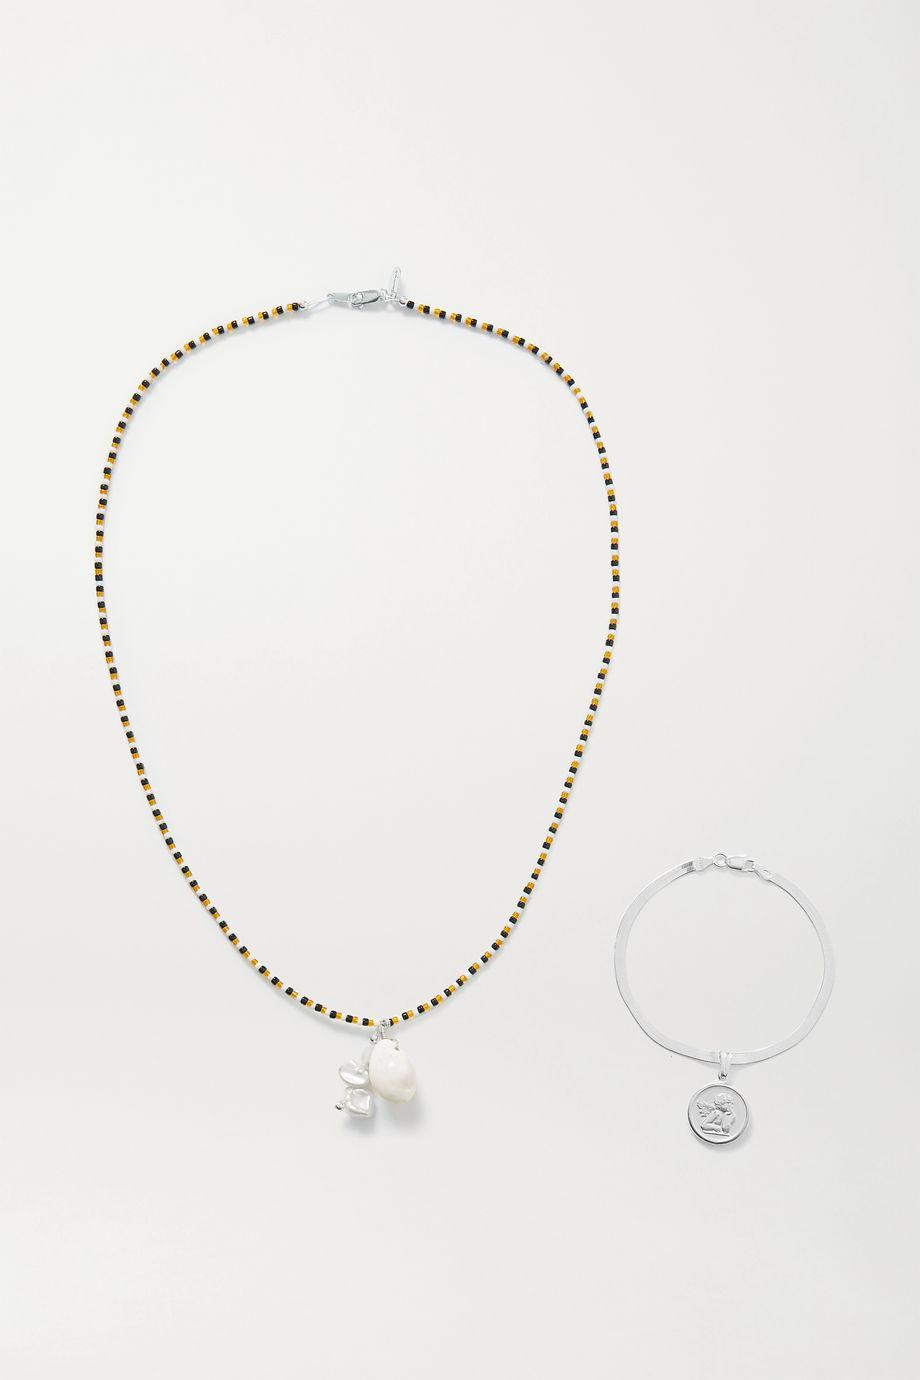 Santangelo Glory's Forever 多种戴法银质、珍珠、贝壳、珠饰身体链